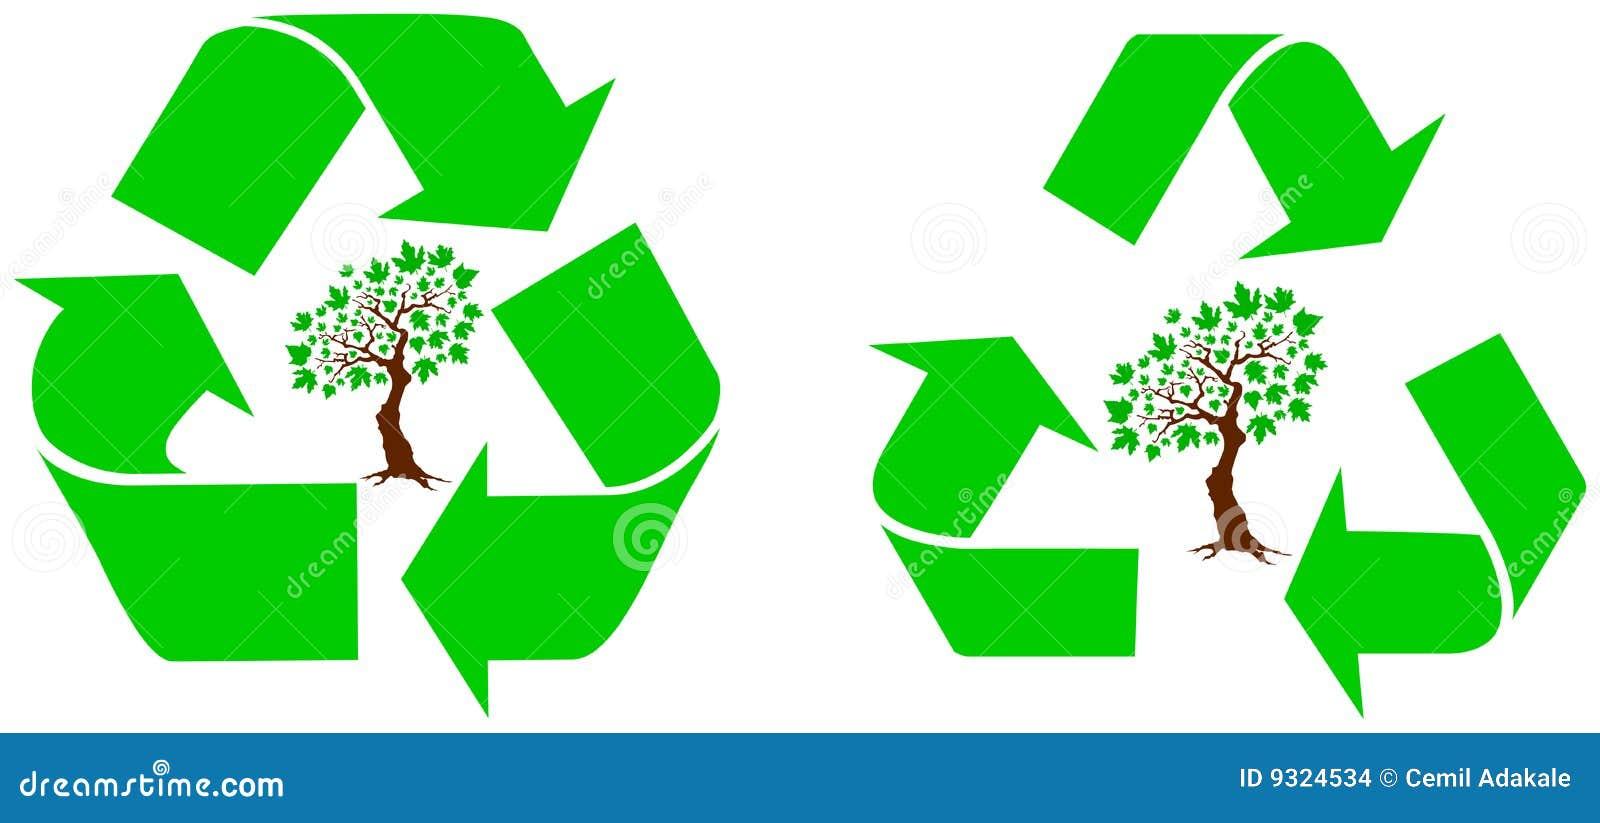 Greenpeace and tree